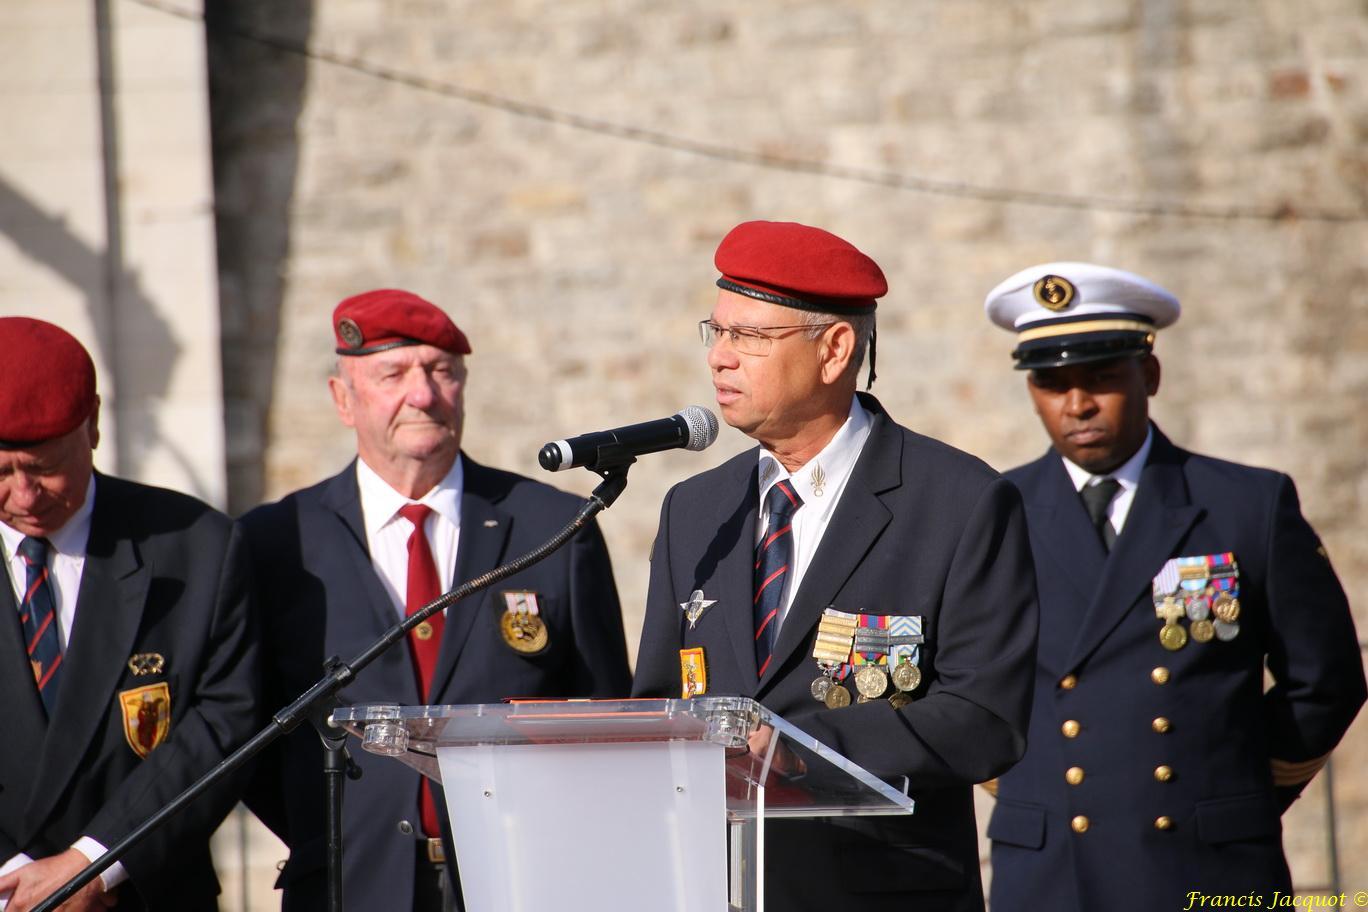 [Association anciens marins] AGASM Amicale RUBIS TOULON - Page 6 7090267510